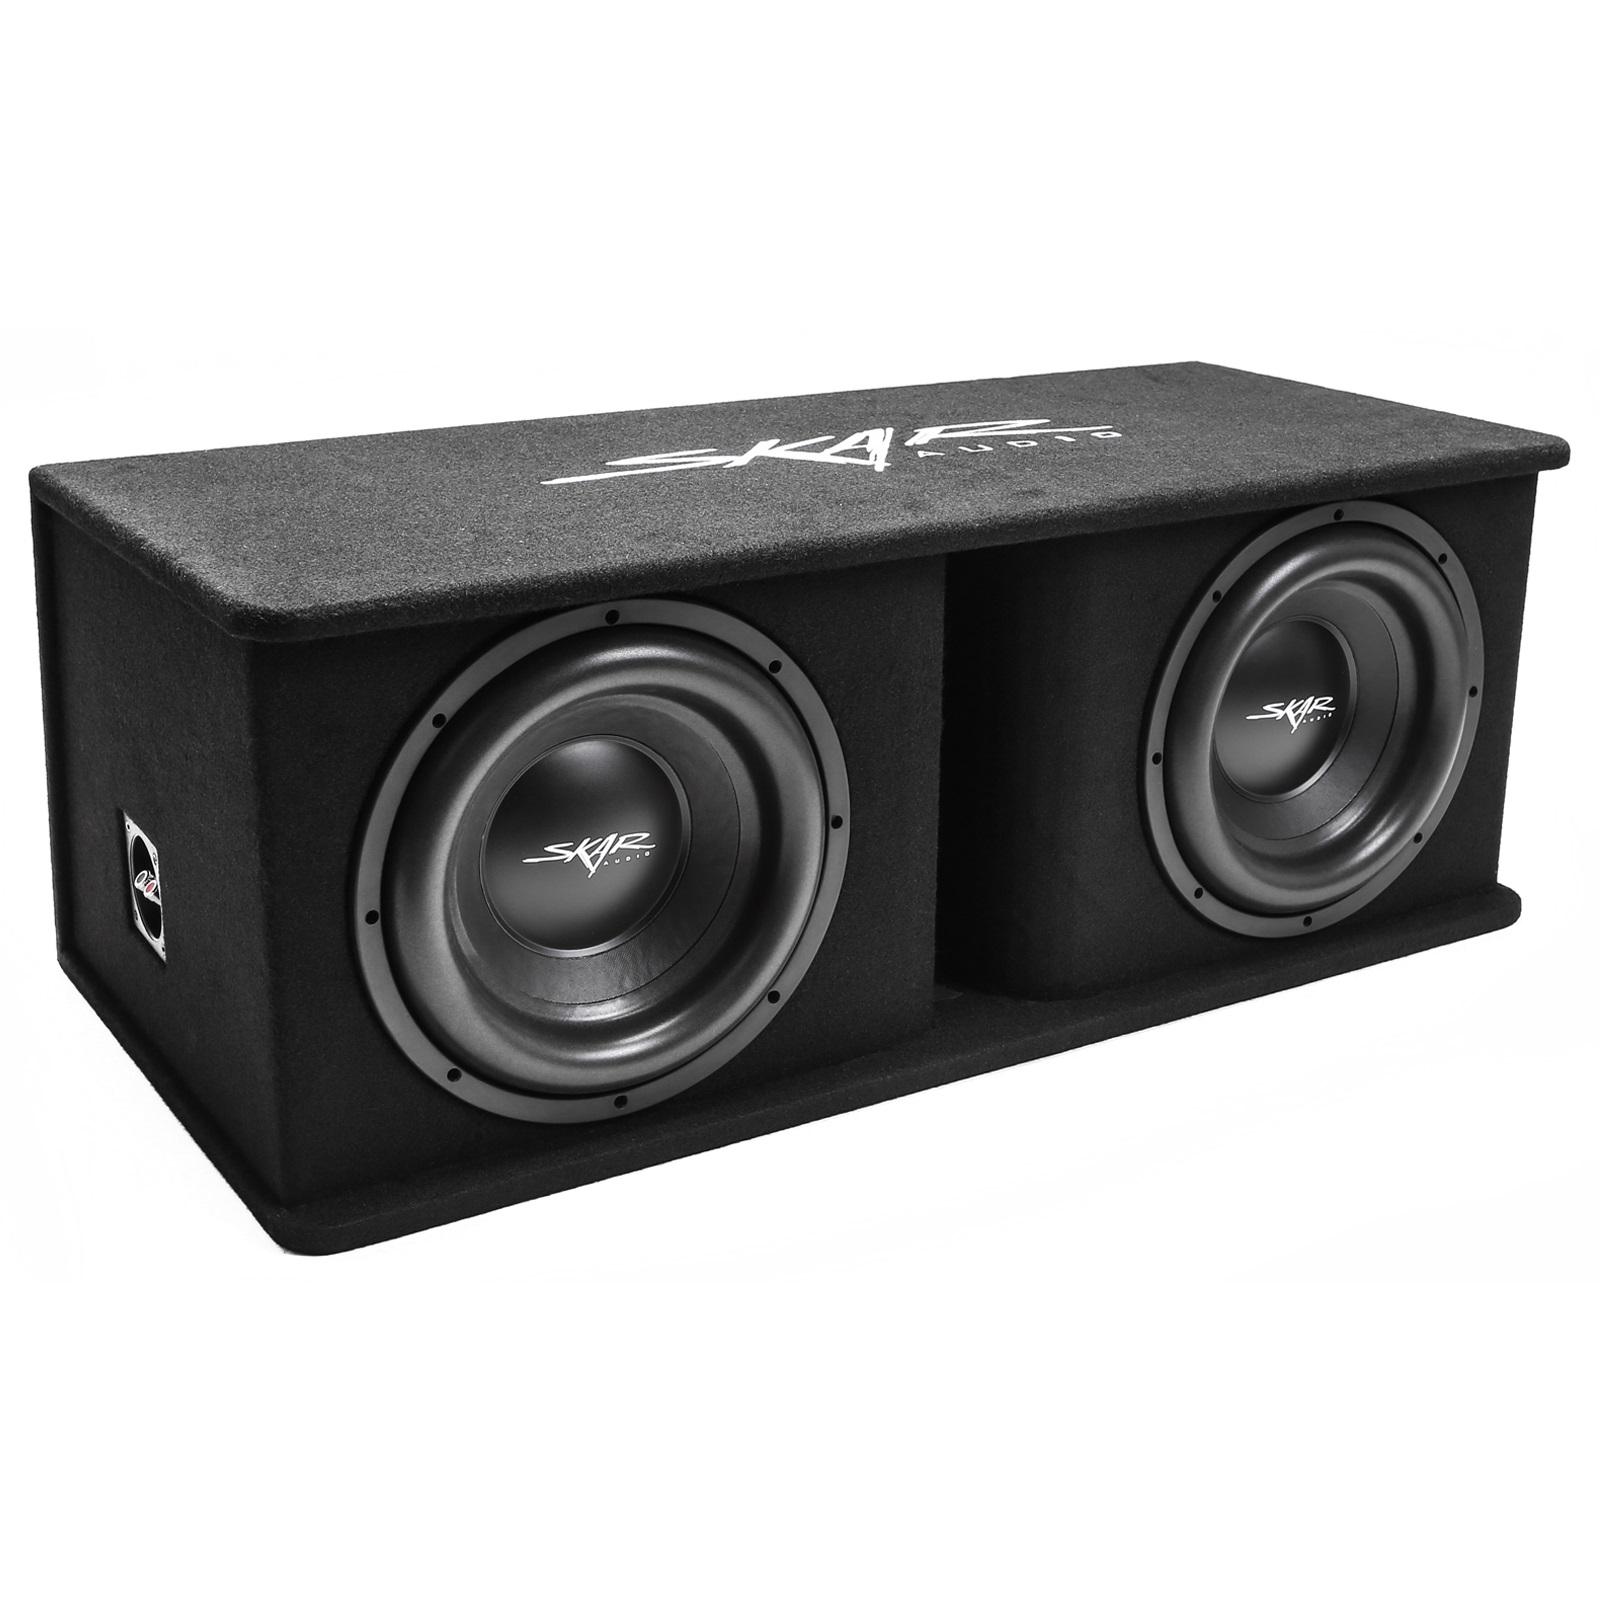 Details about NEW SKAR AUDIO SDR-2X12D4 DUAL 12